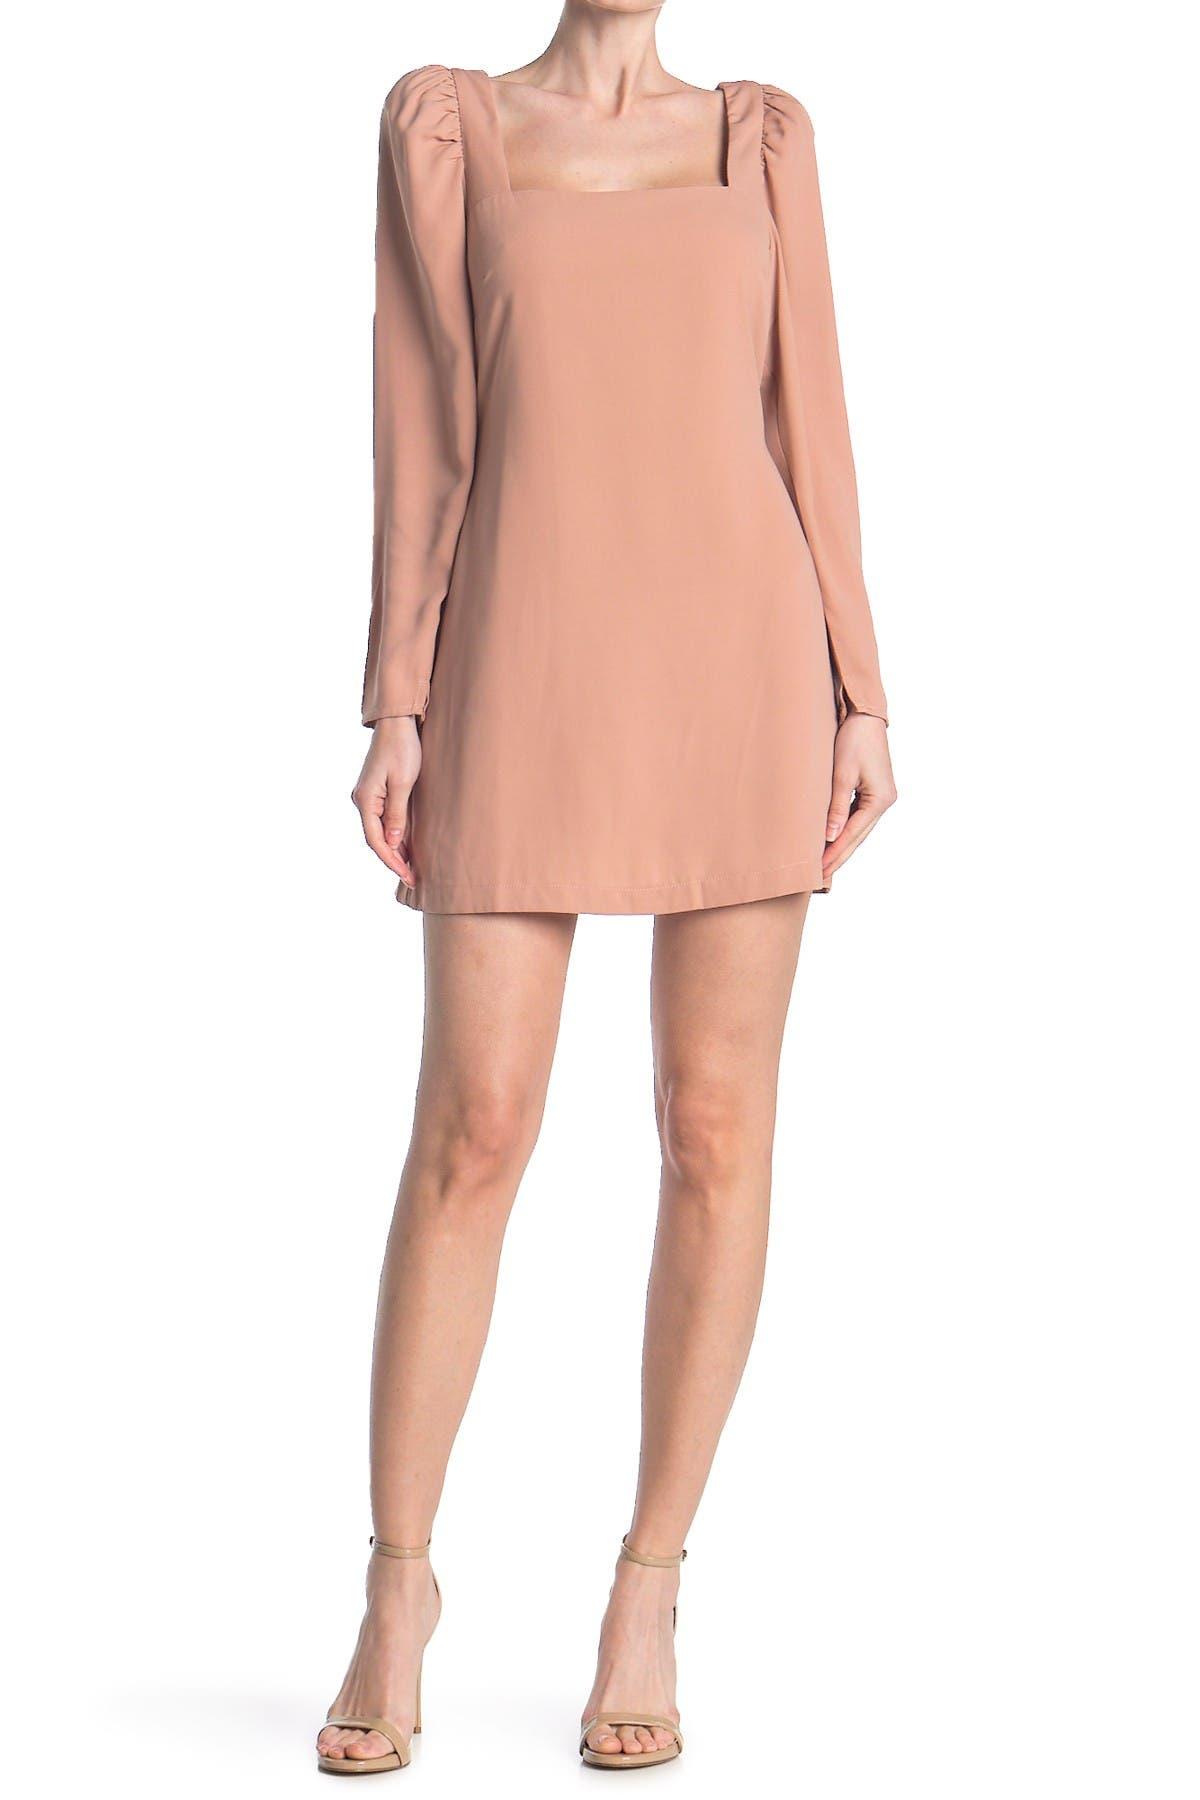 Re:named apparel Allie Puff Sleeve Mini Dress